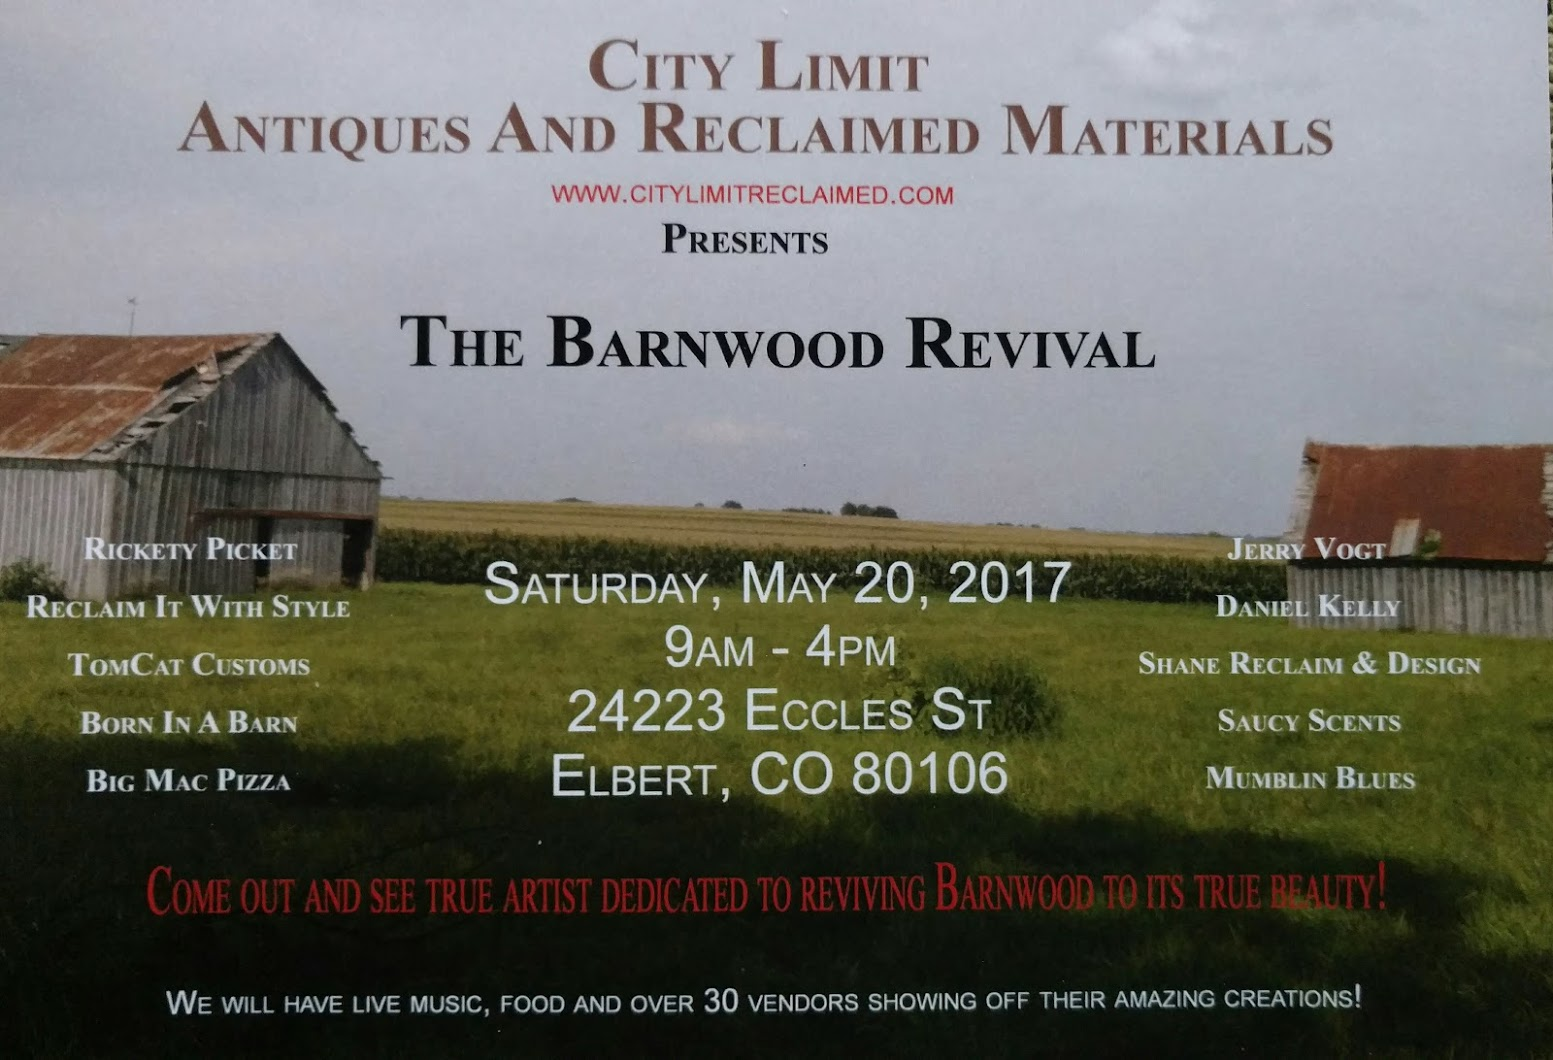 Barnwood Revival